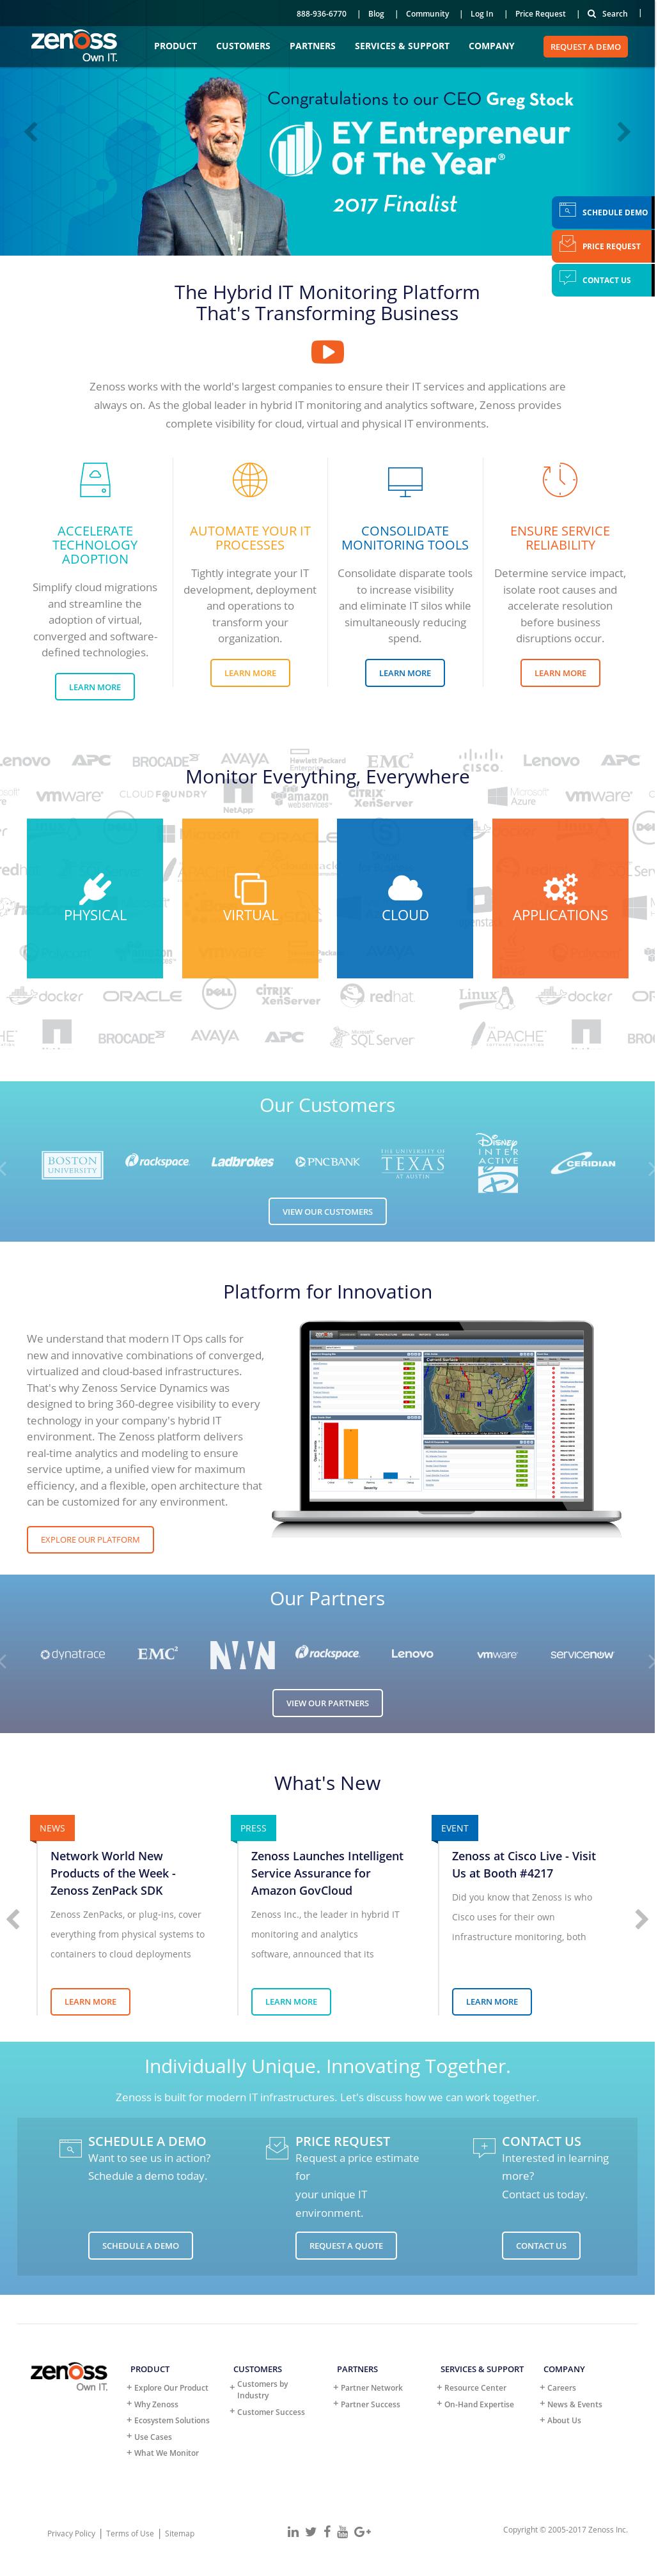 Zenoss Competitors, Revenue and Employees - Owler Company Profile